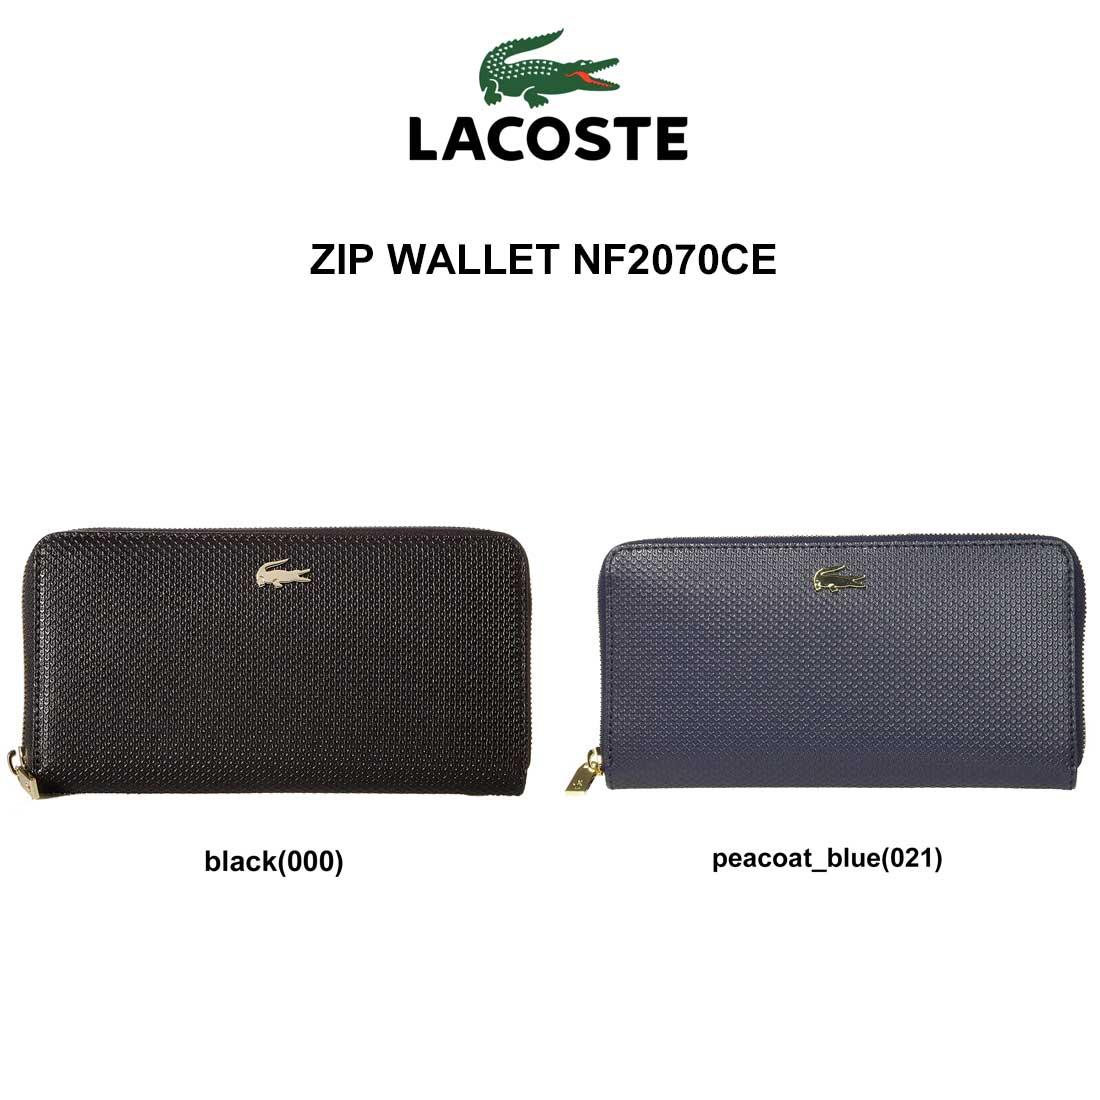 LACOSTE(ラコステ)長財布 ラウンドファスナー ジッパー 本革 レディース ZIP WALLET NF2070CE